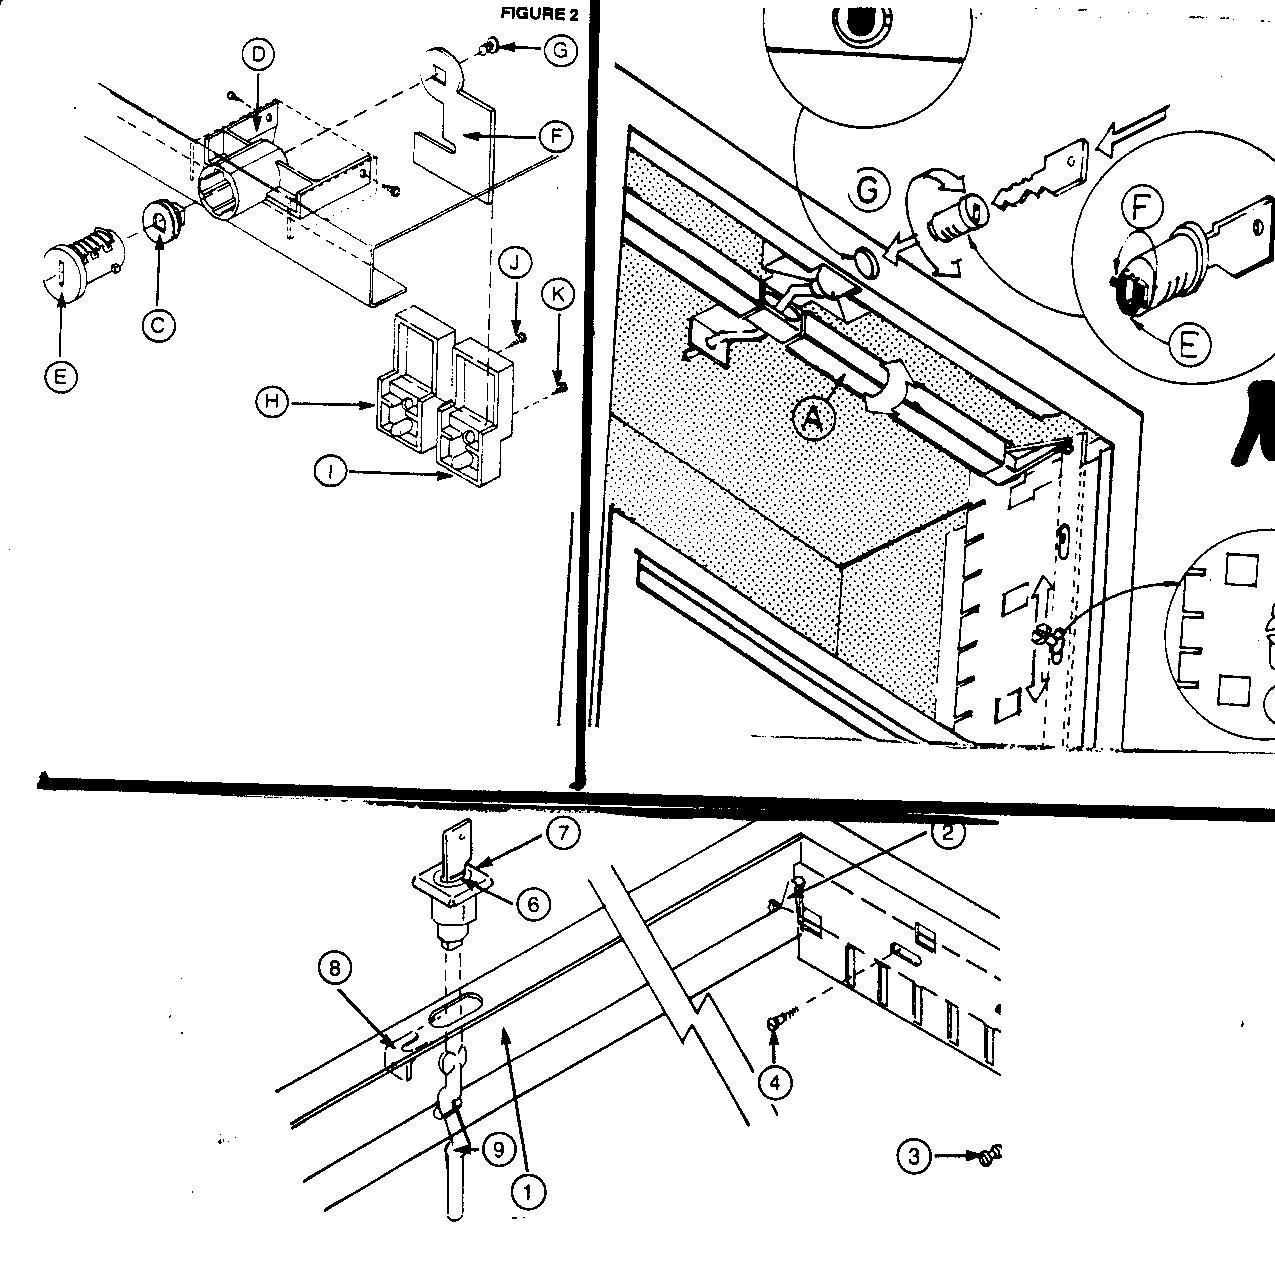 Filing Cabinet Drawing At Getdrawings